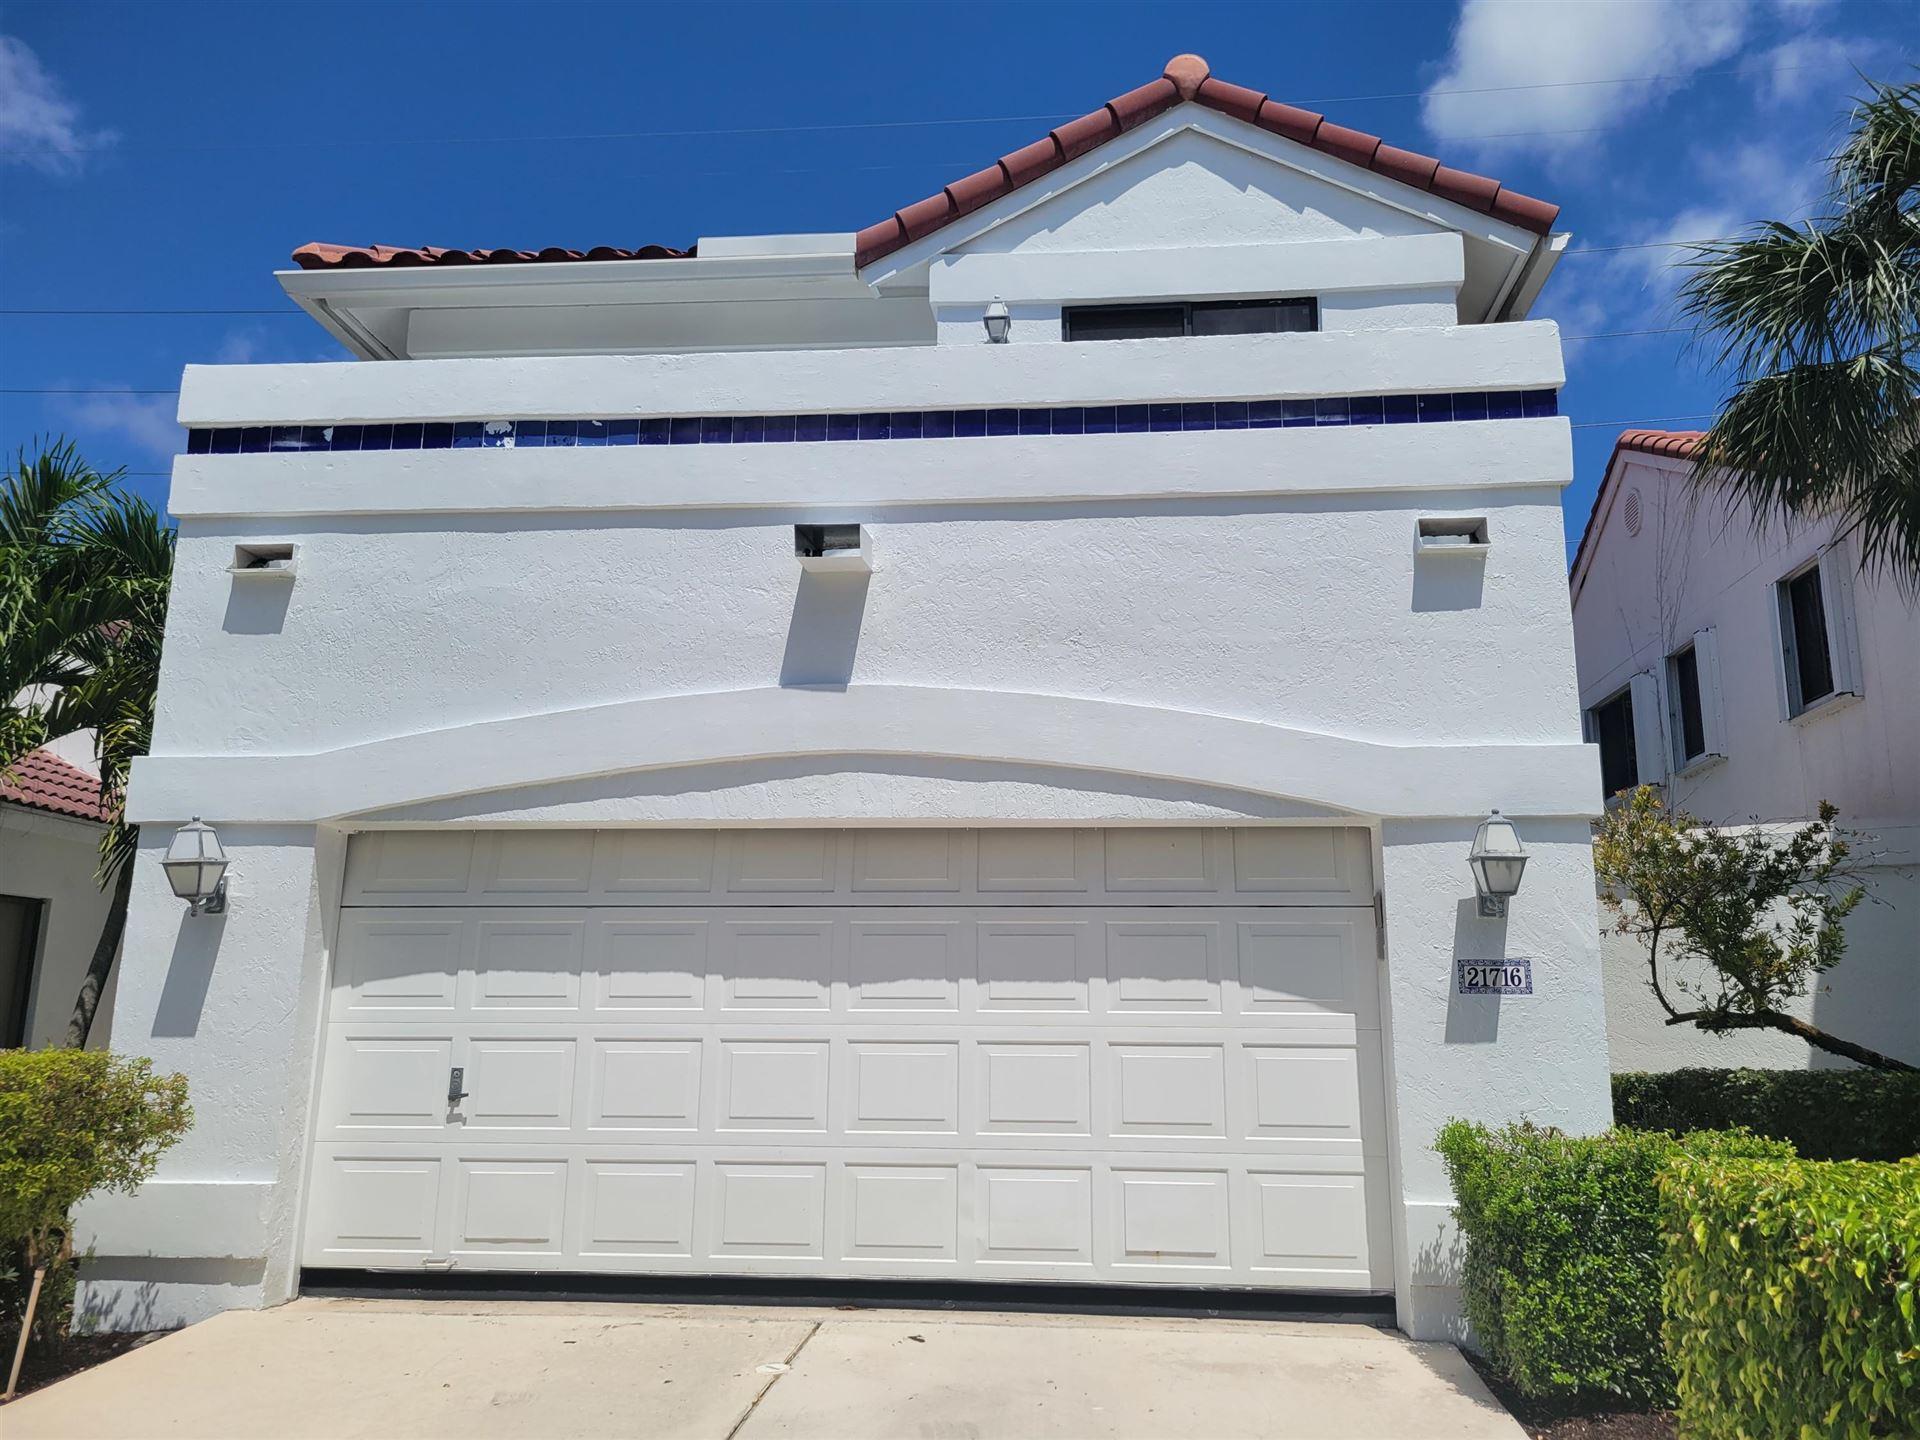 21716 Wapford Way, Boca Raton, FL 33486 - MLS#: RX-10713643